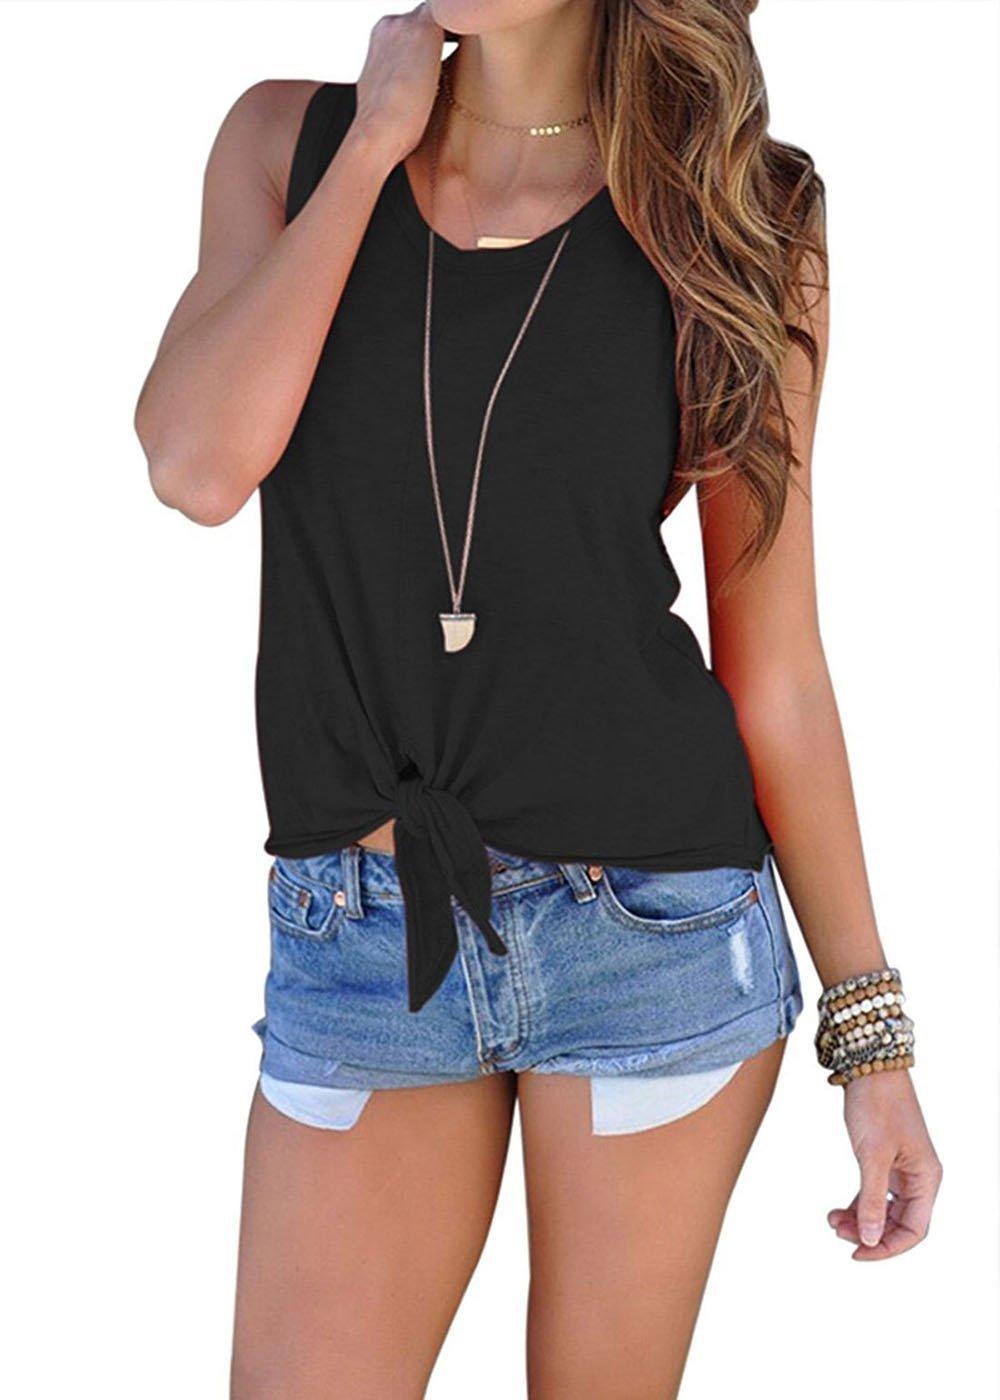 Tiaoqi Women's Summer Casual Sleeveless Shirts Blouses Front Tie Cami Black Tank Tops (Black, M)